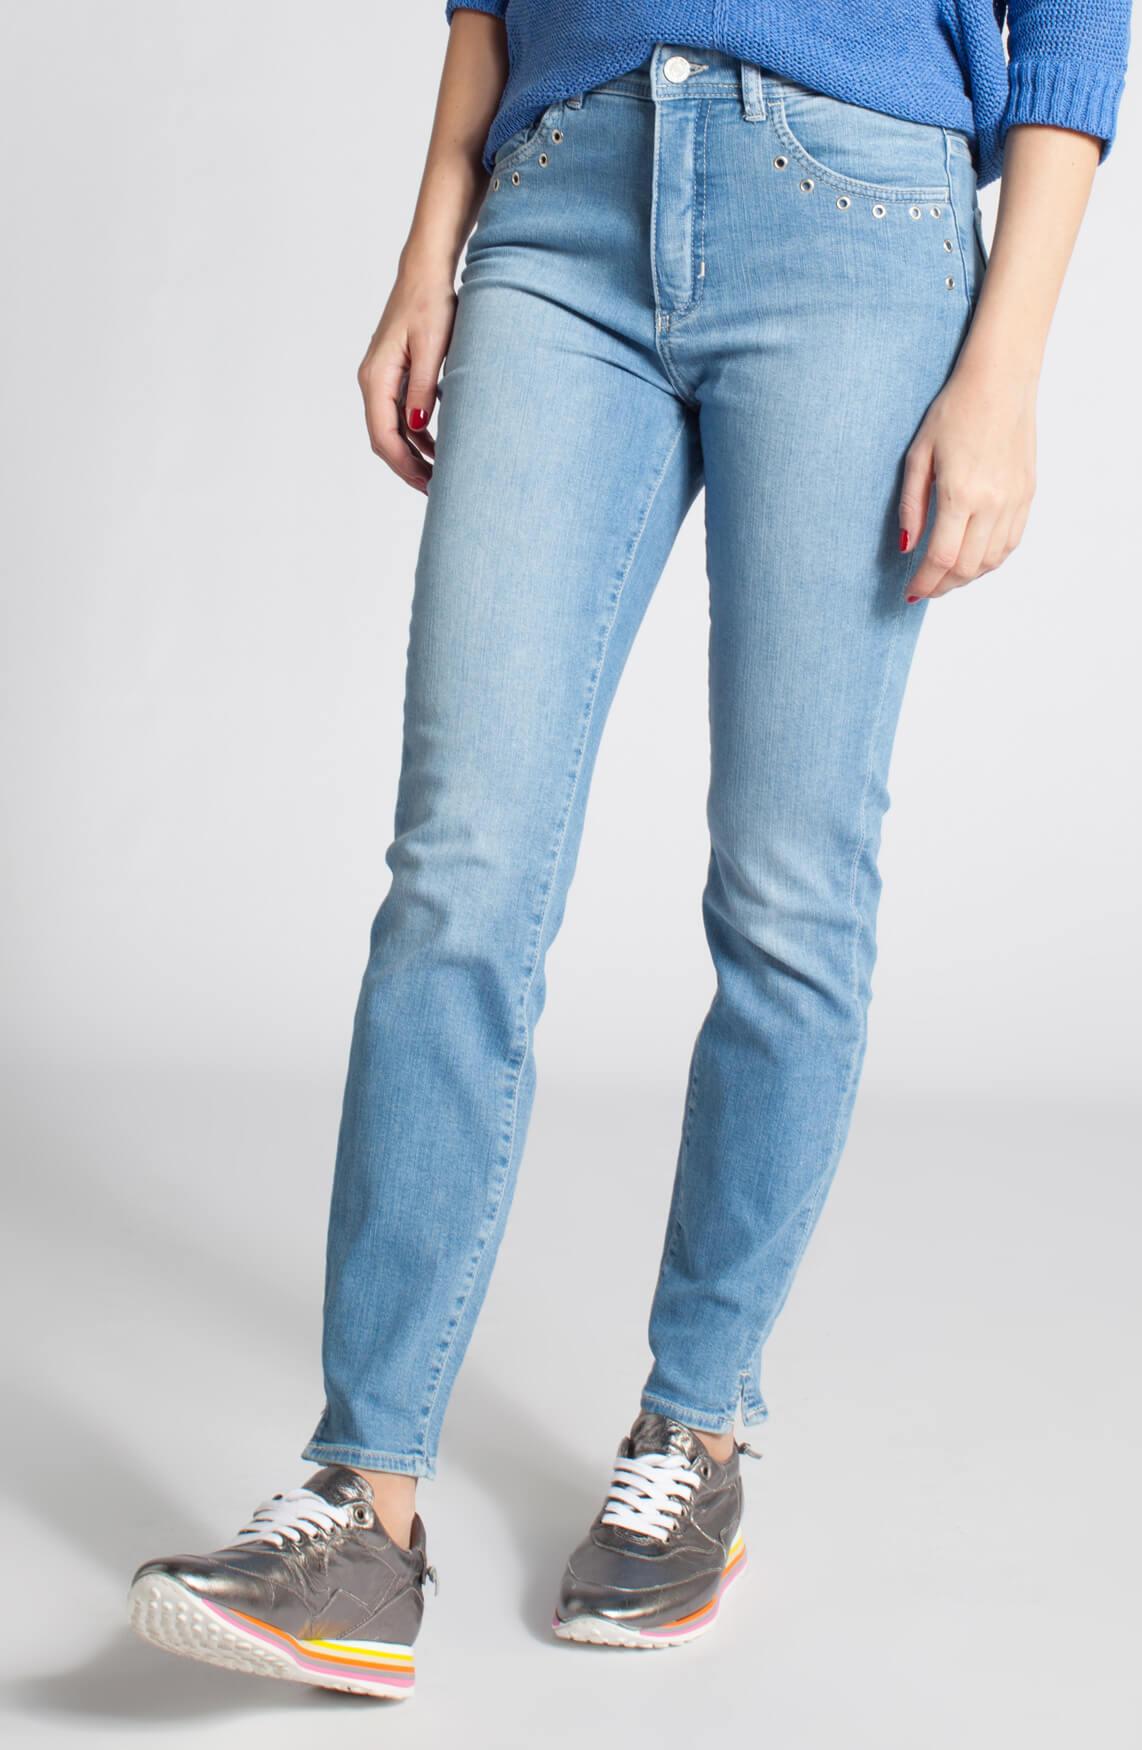 Rosner Dames Audrey jeans met eyelet detail 0